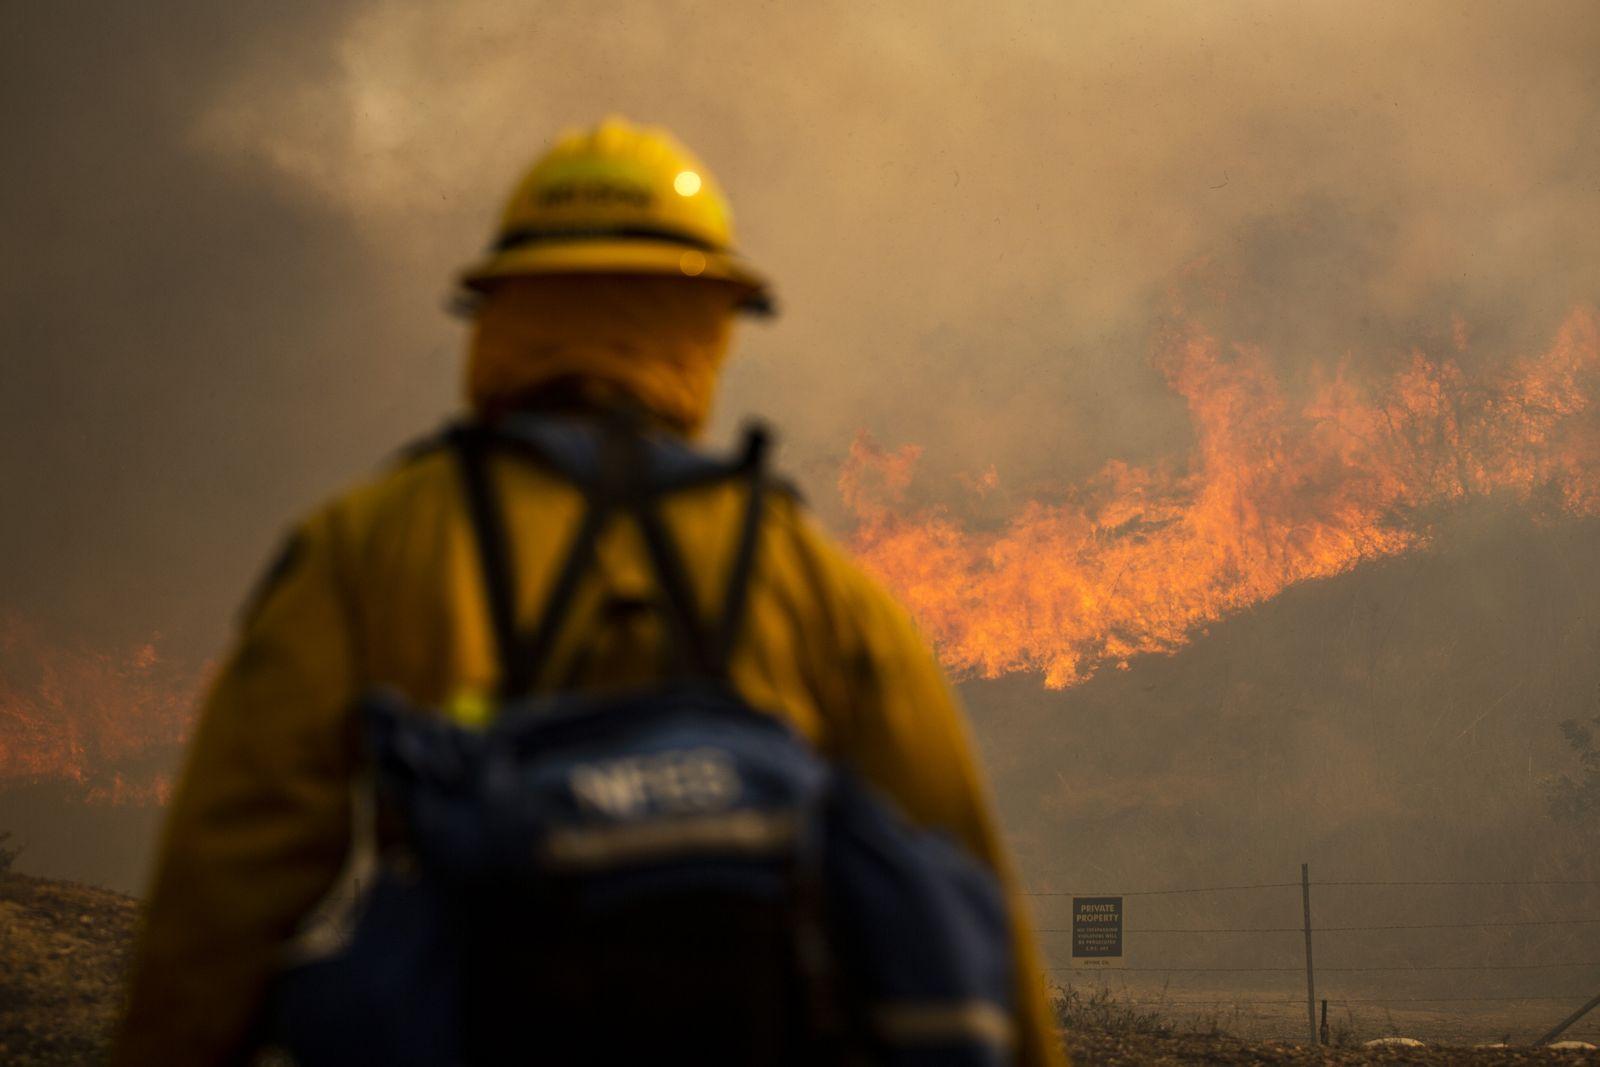 Silverado Fire burns near Irvine, USA - 26 Oct 2020